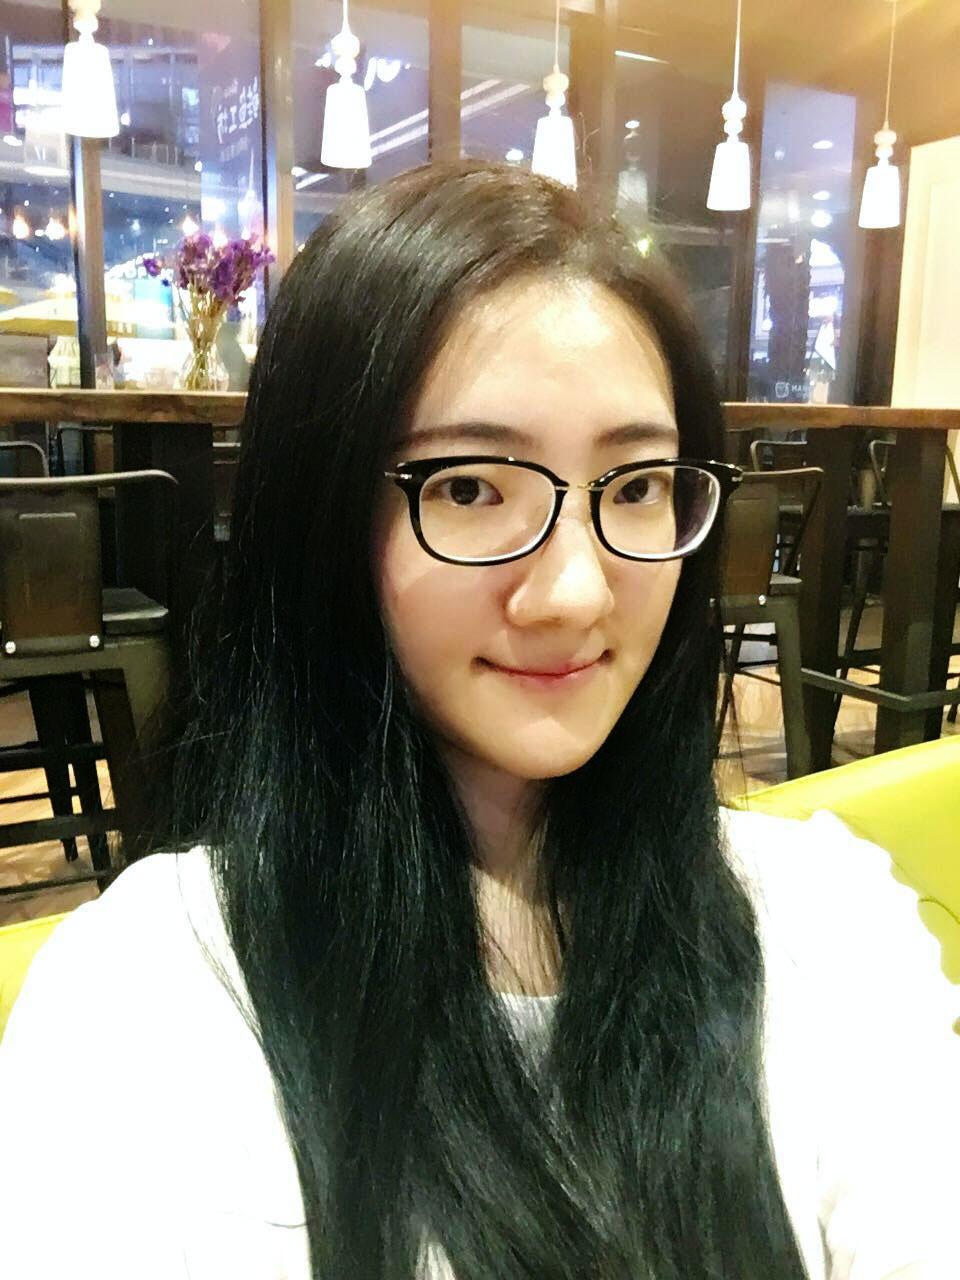 Go to MA WENJUAN's profile